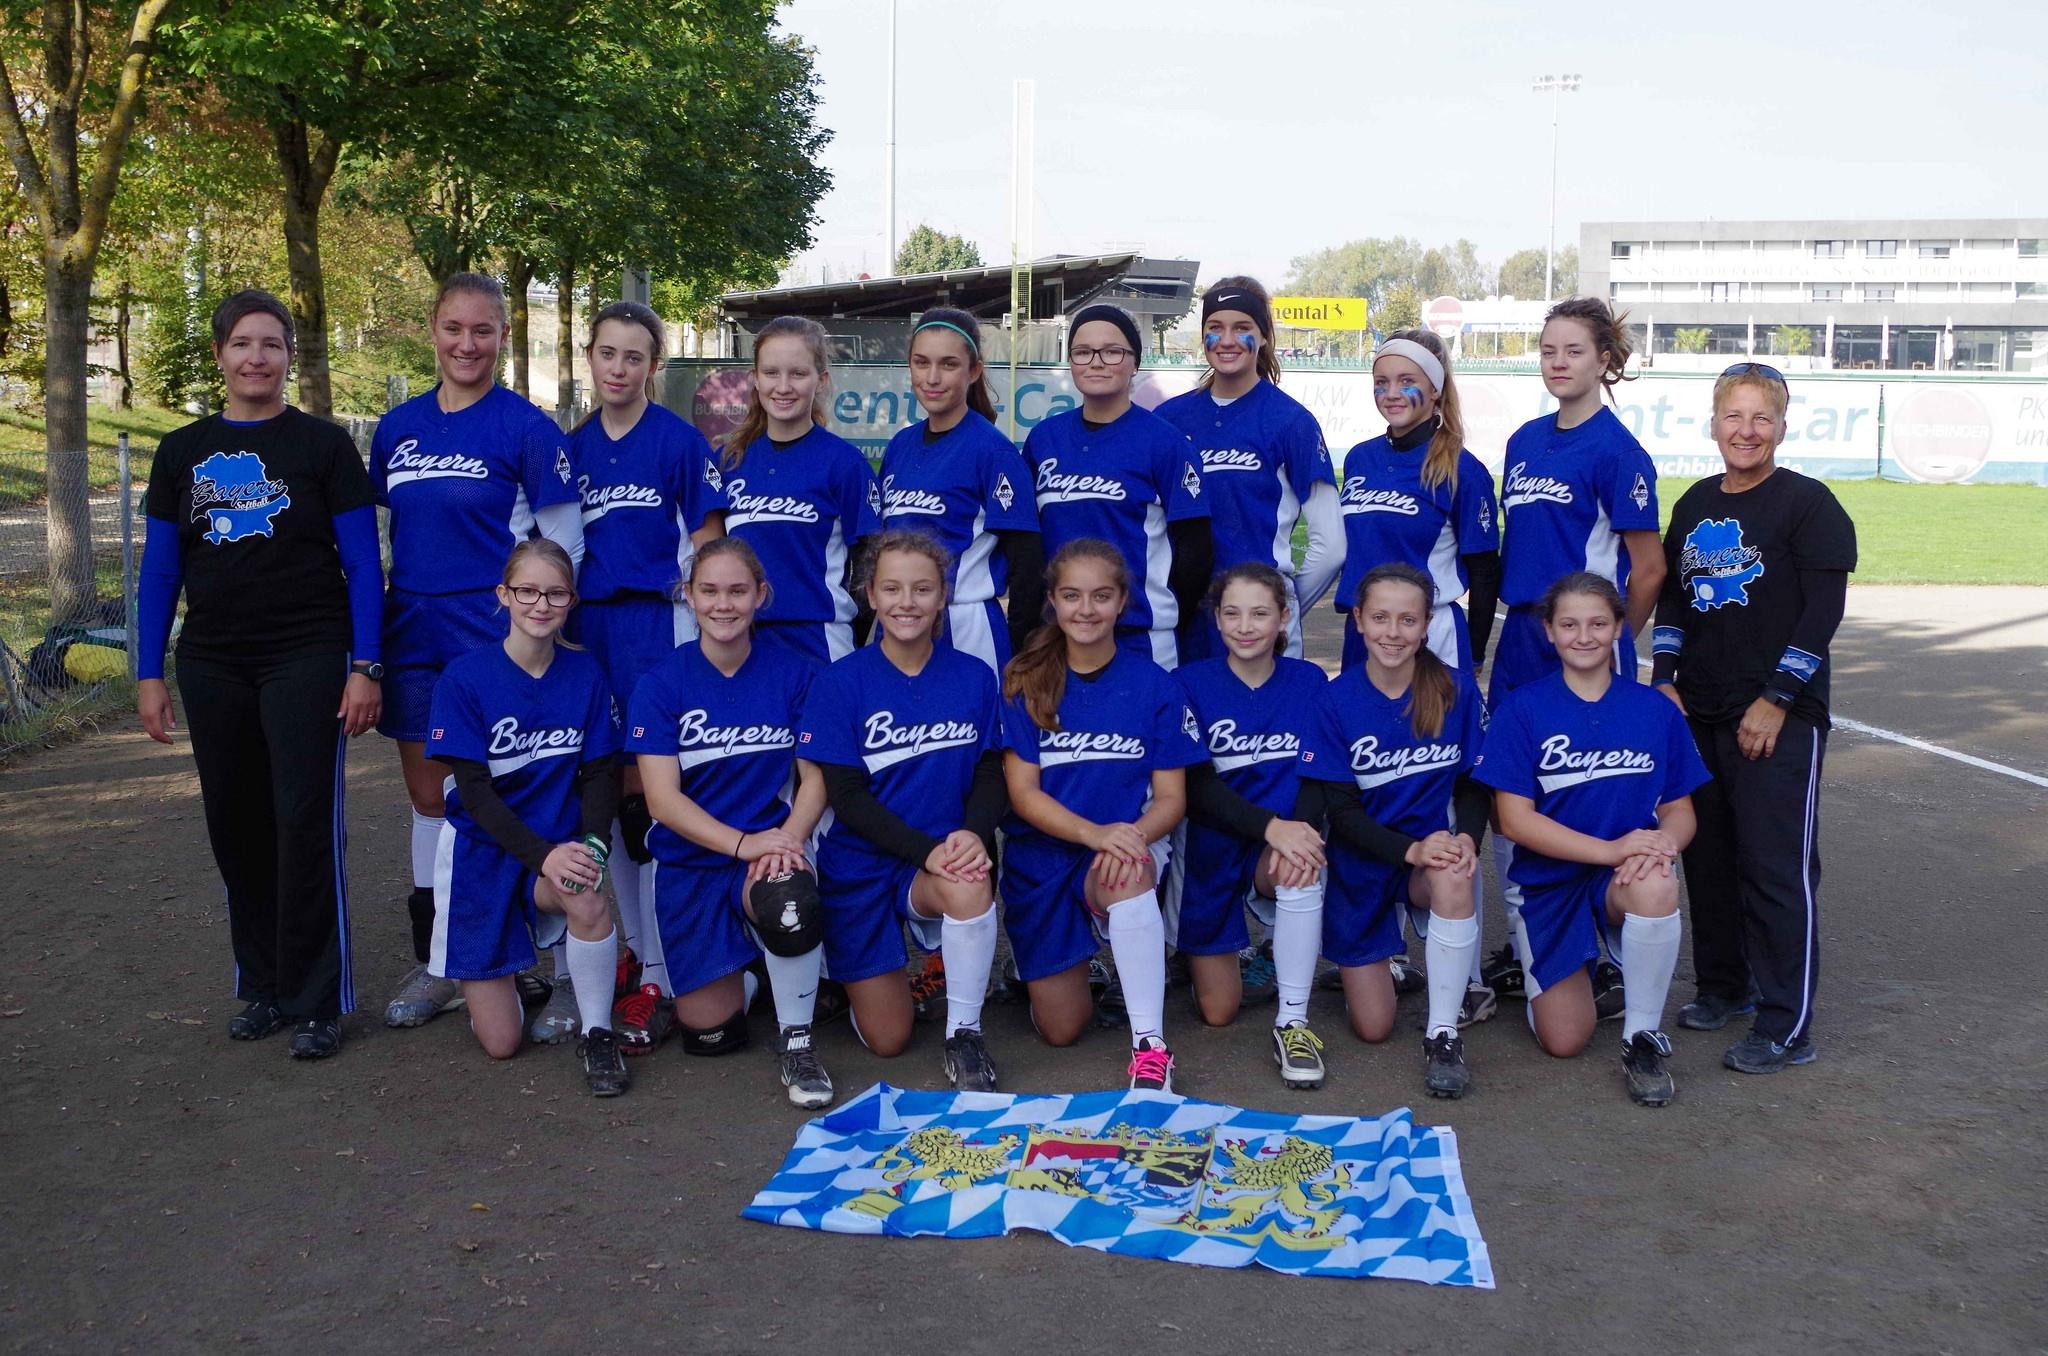 lp-u16-regensburg-baw-u16-team